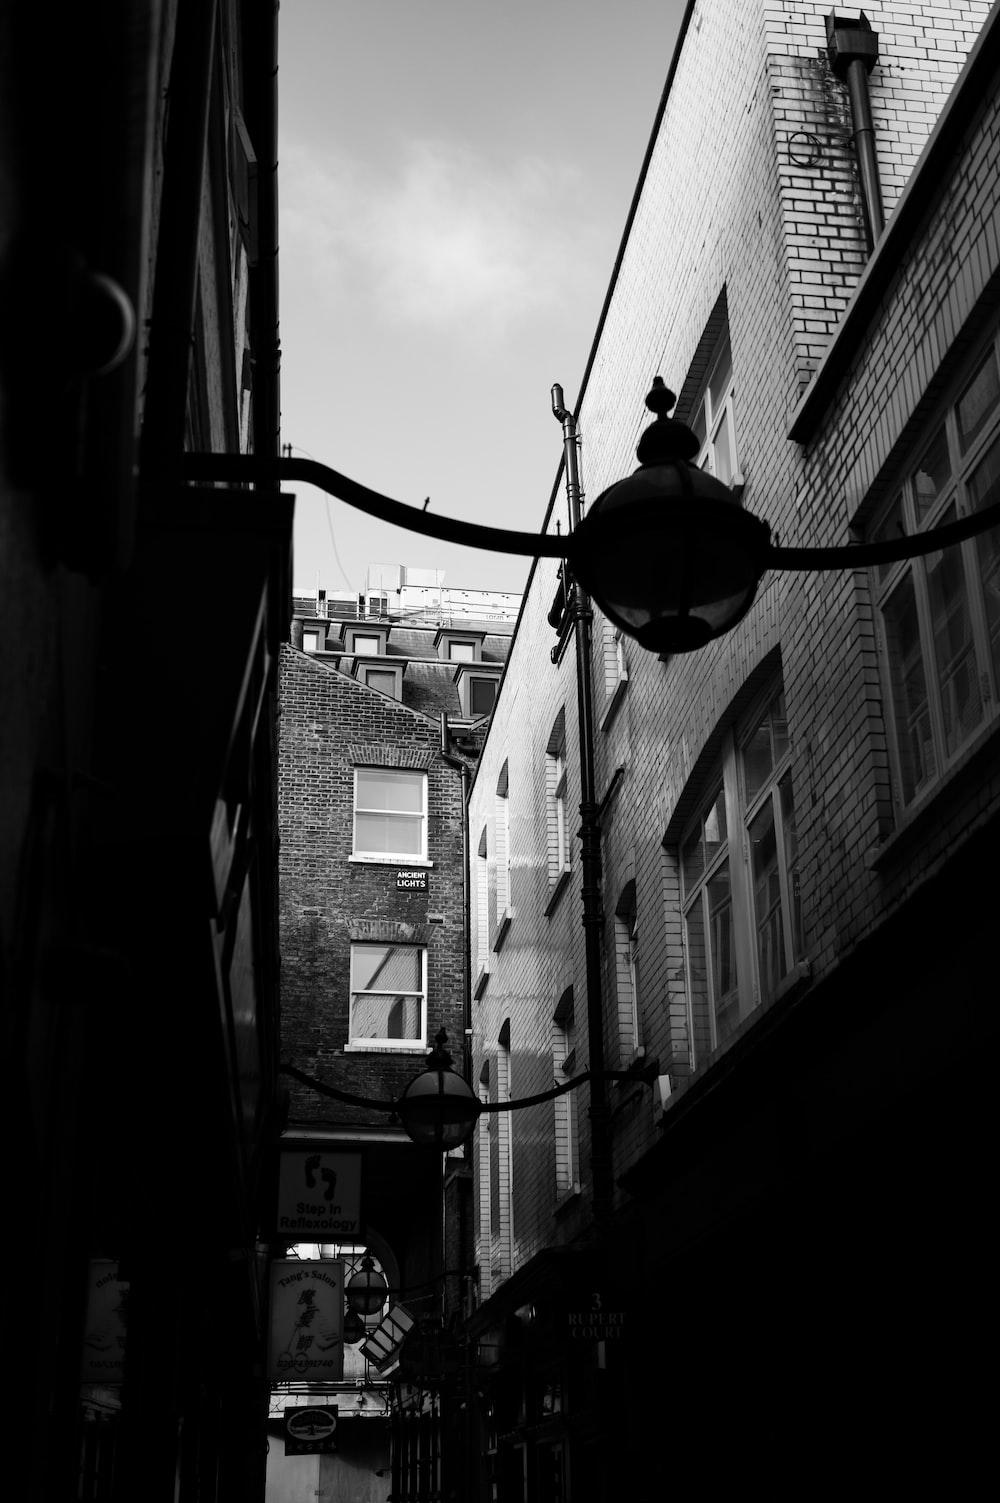 grayscale photo of street light